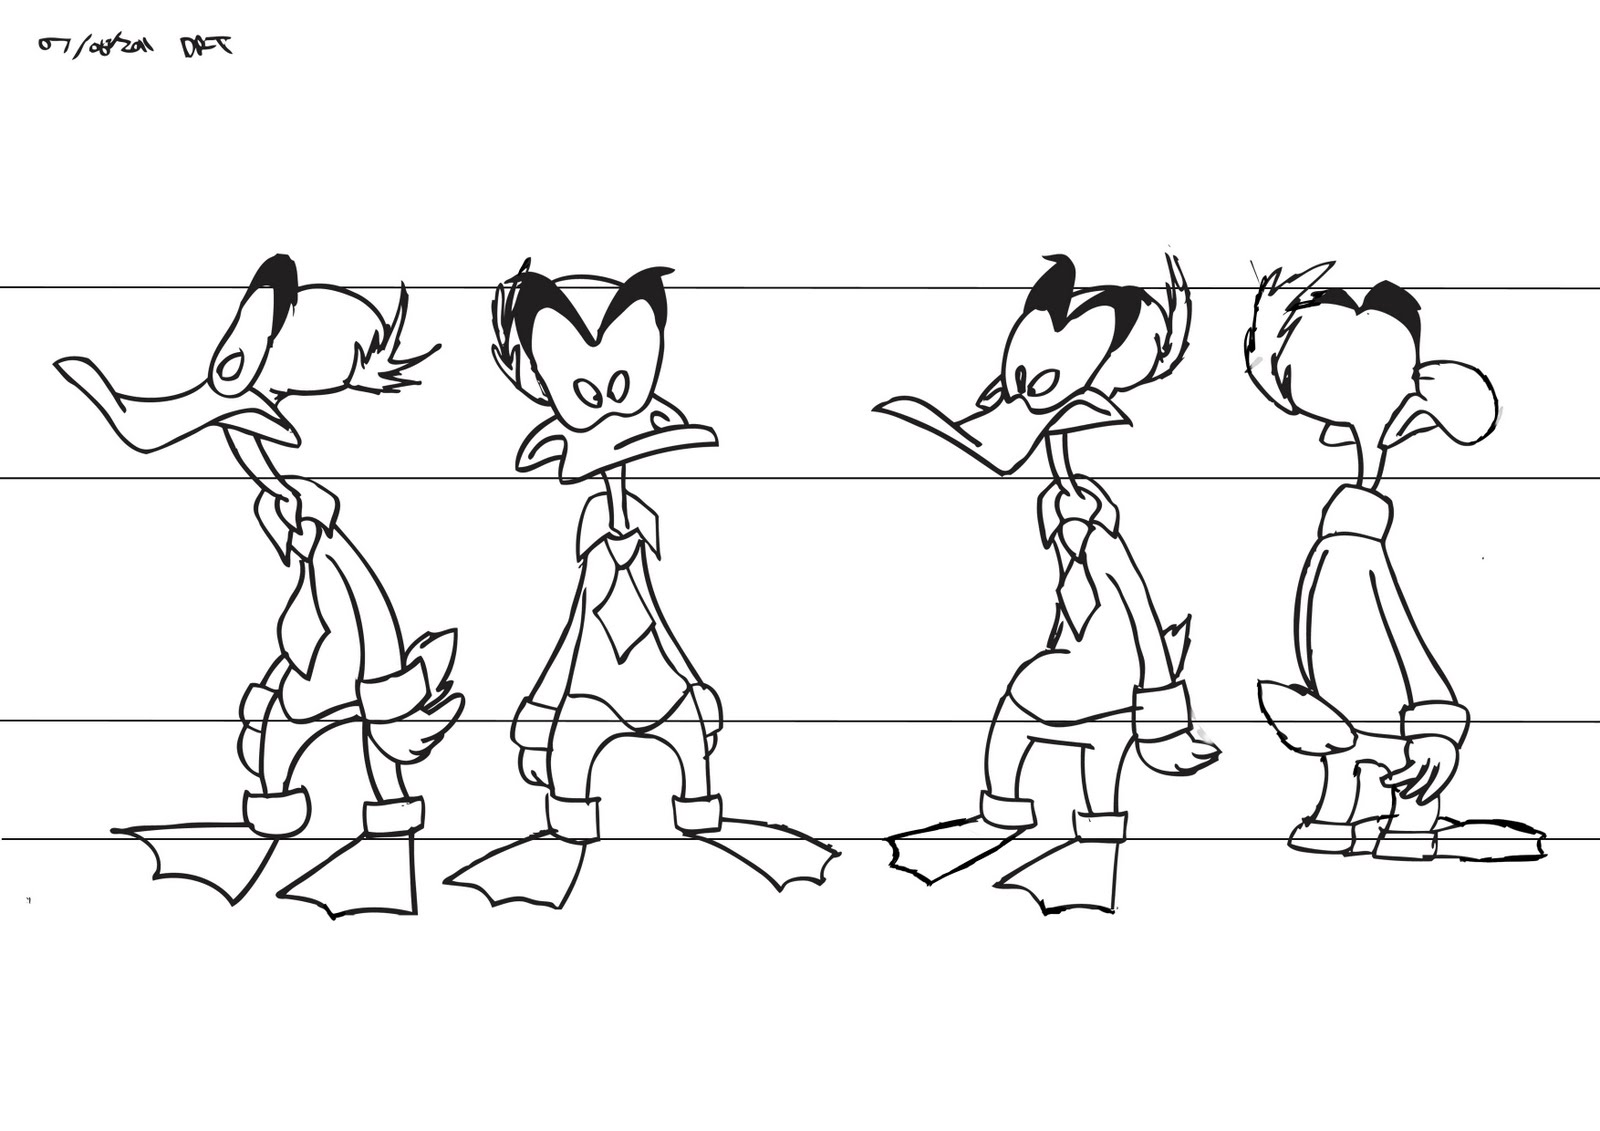 Animated Heads: June 2011